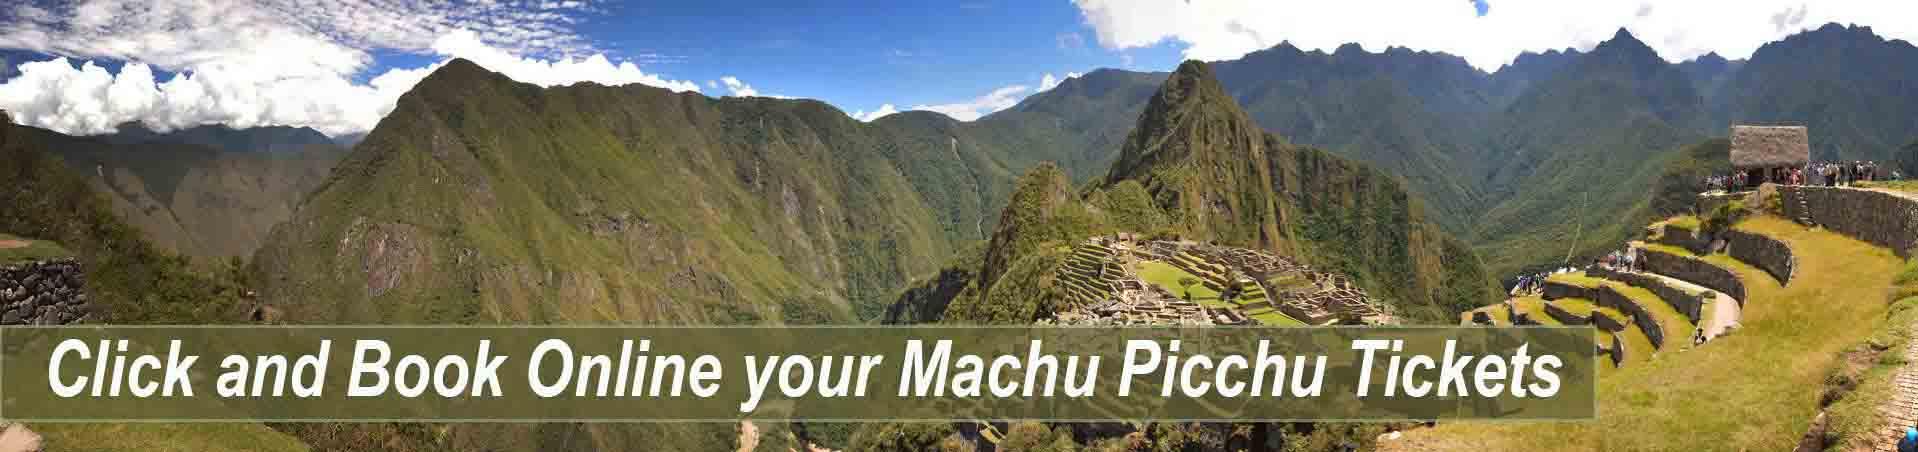 Book Online yor Machu Picchu tickets